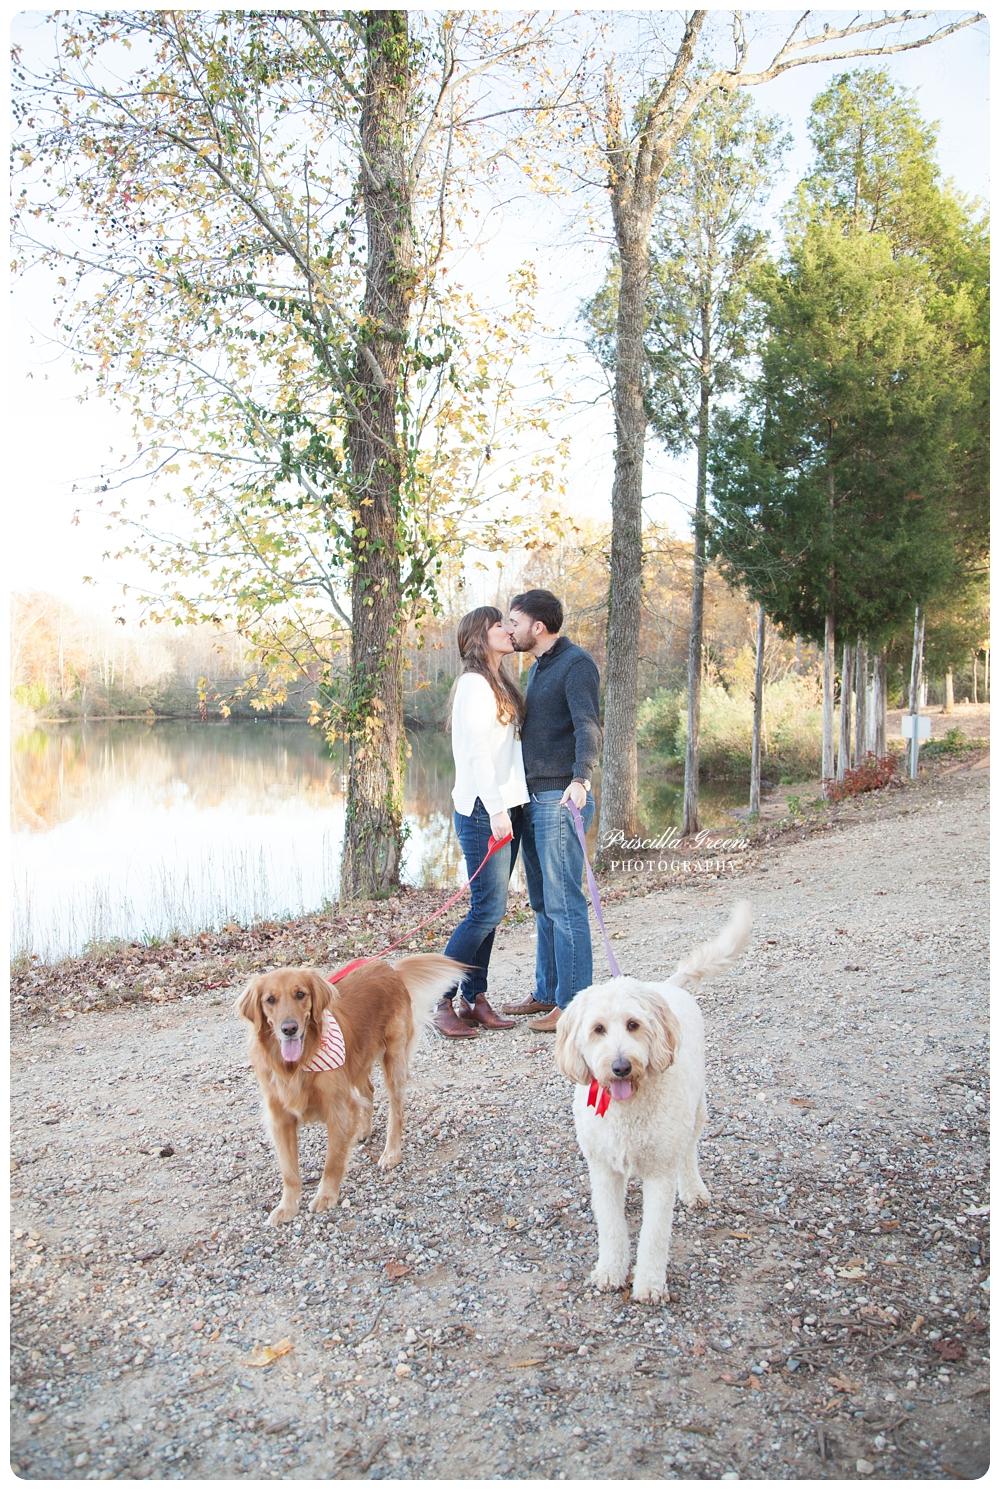 couple_charlottephotographer_Priscillagreenphotography_0002.jpg